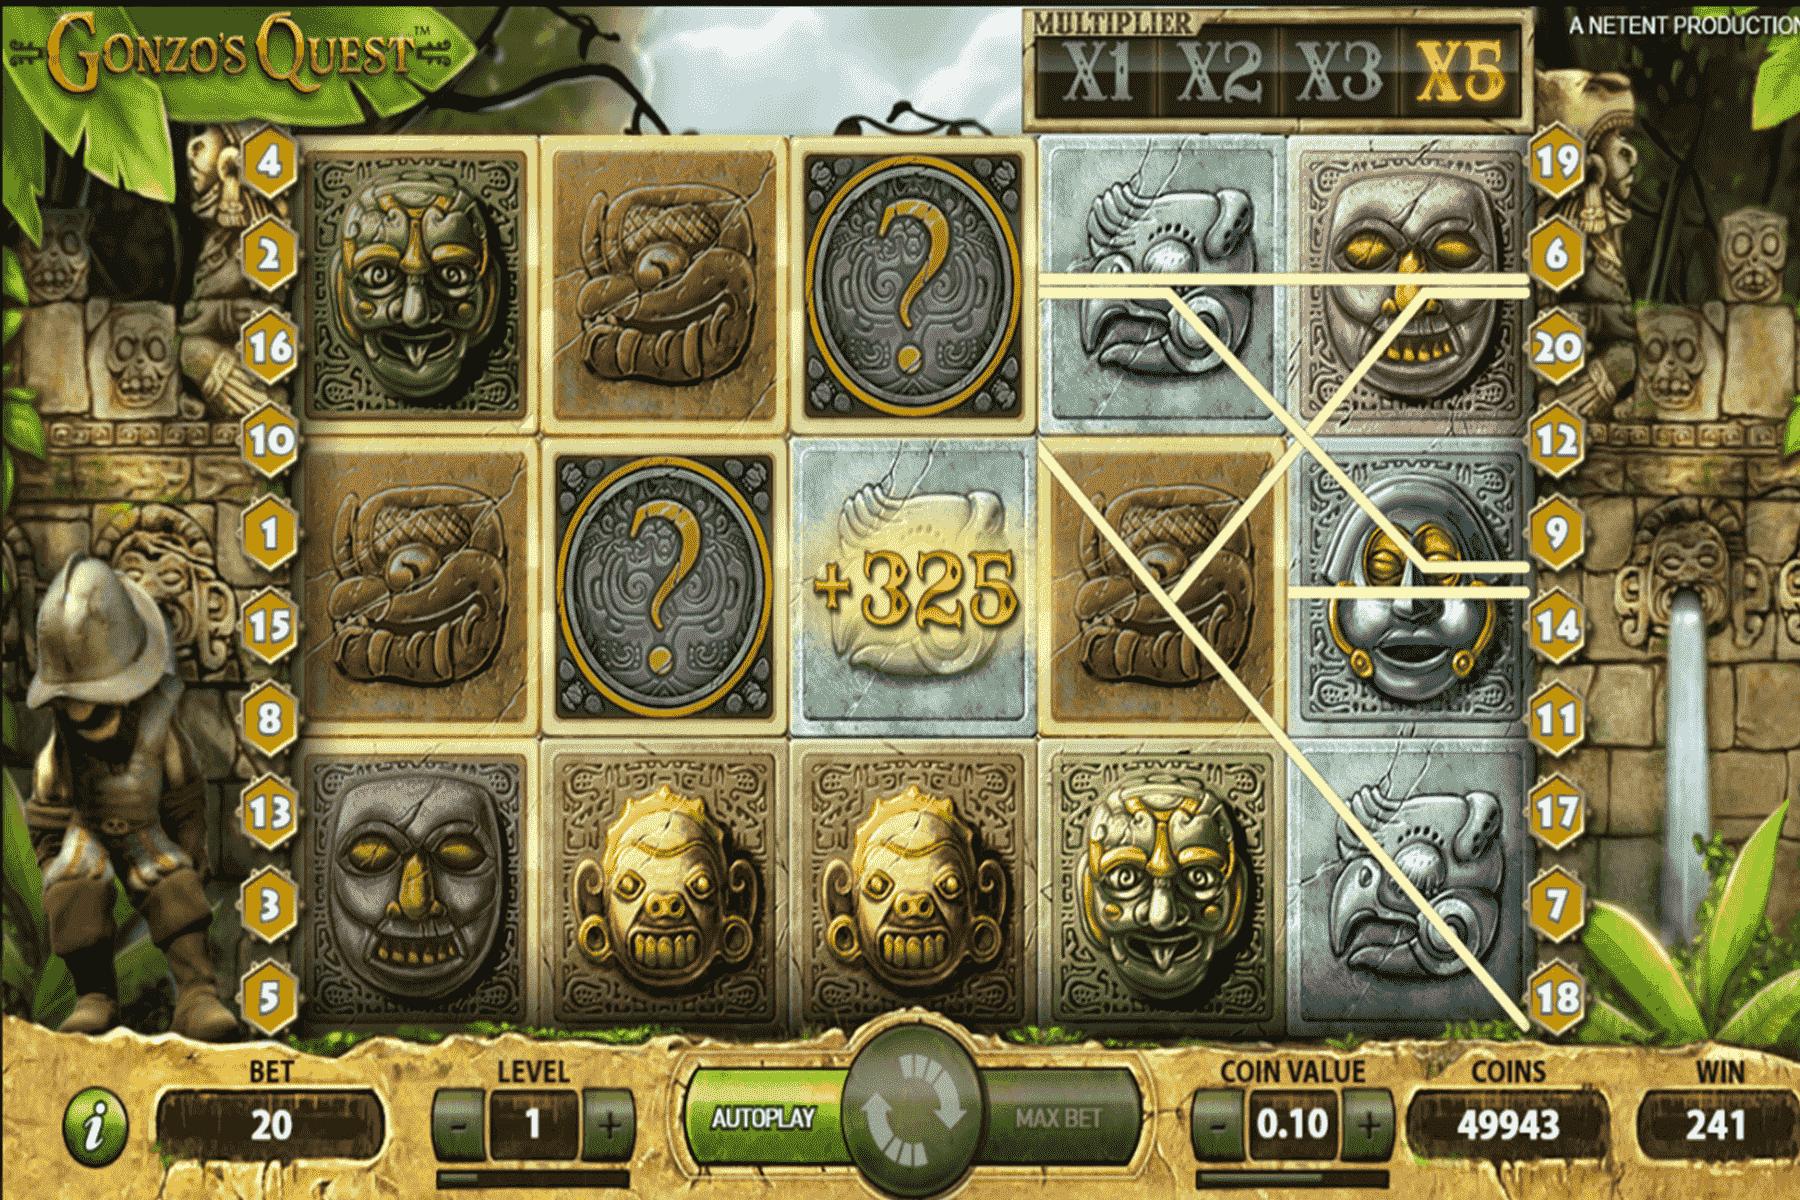 mejores slots online